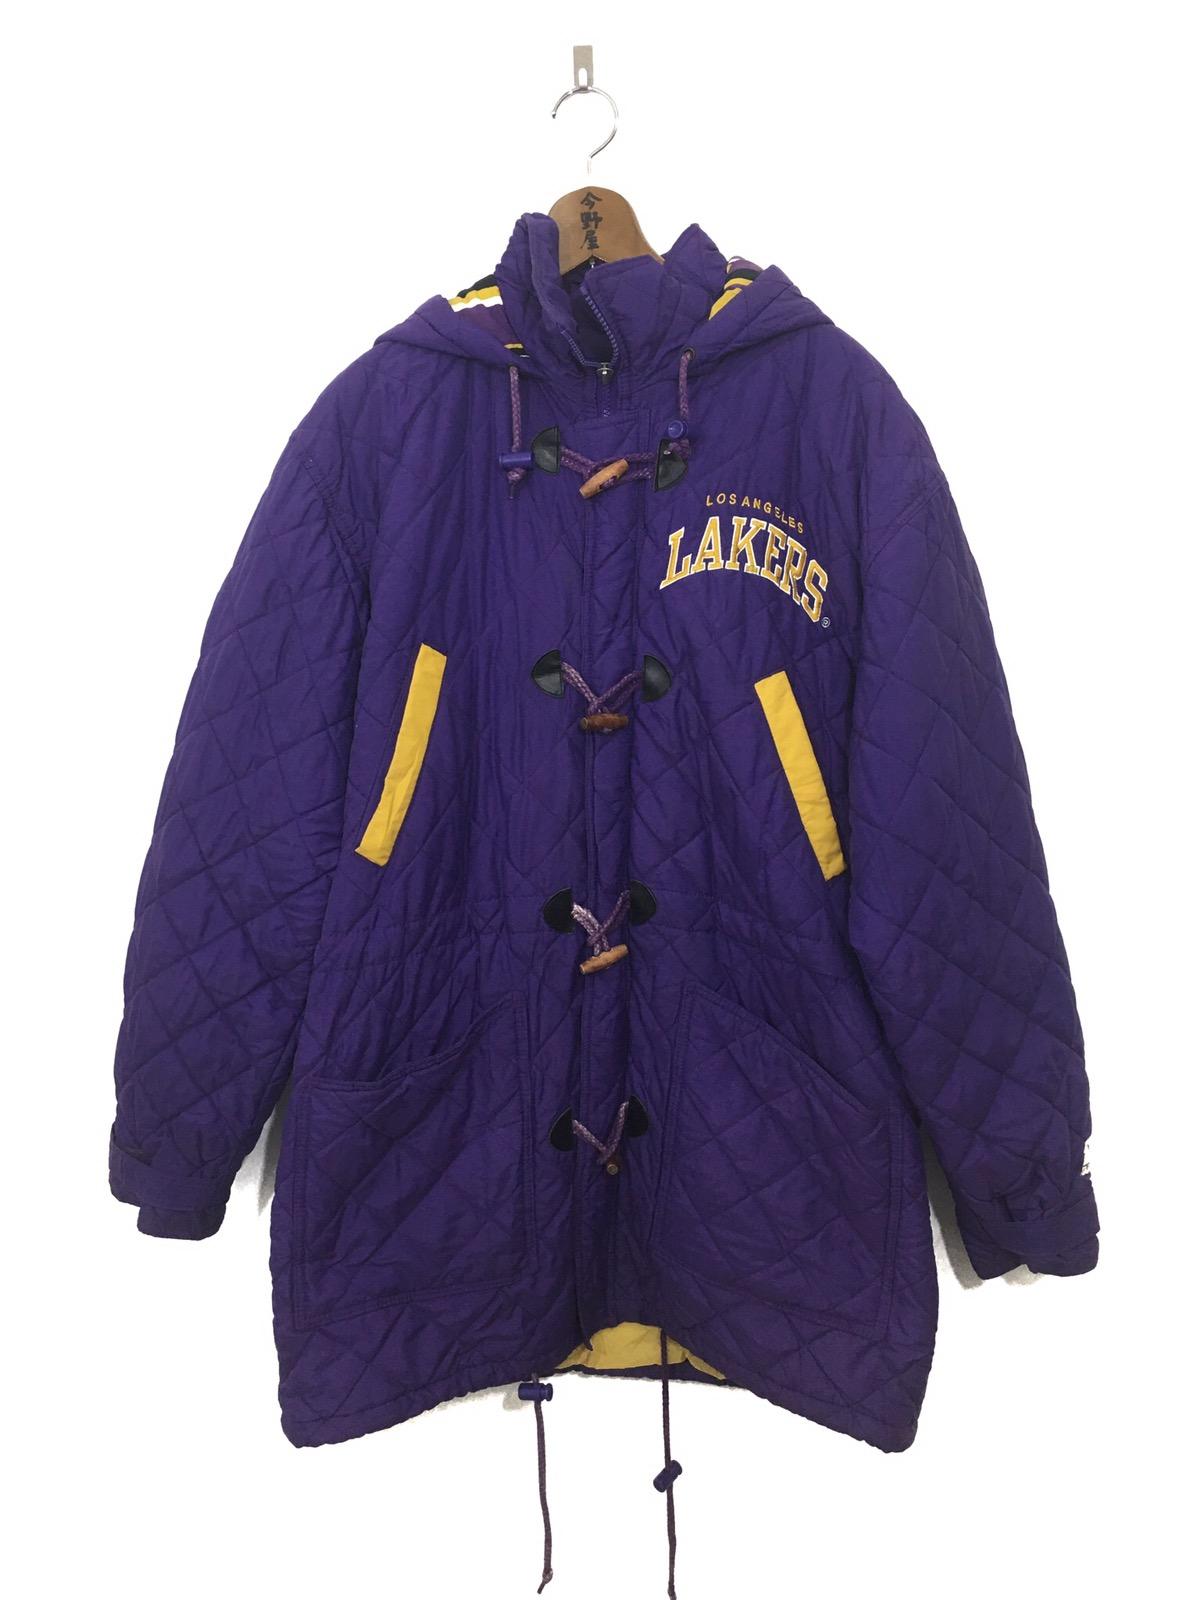 Vintage Vintage L A Lakers Jacket Grailed